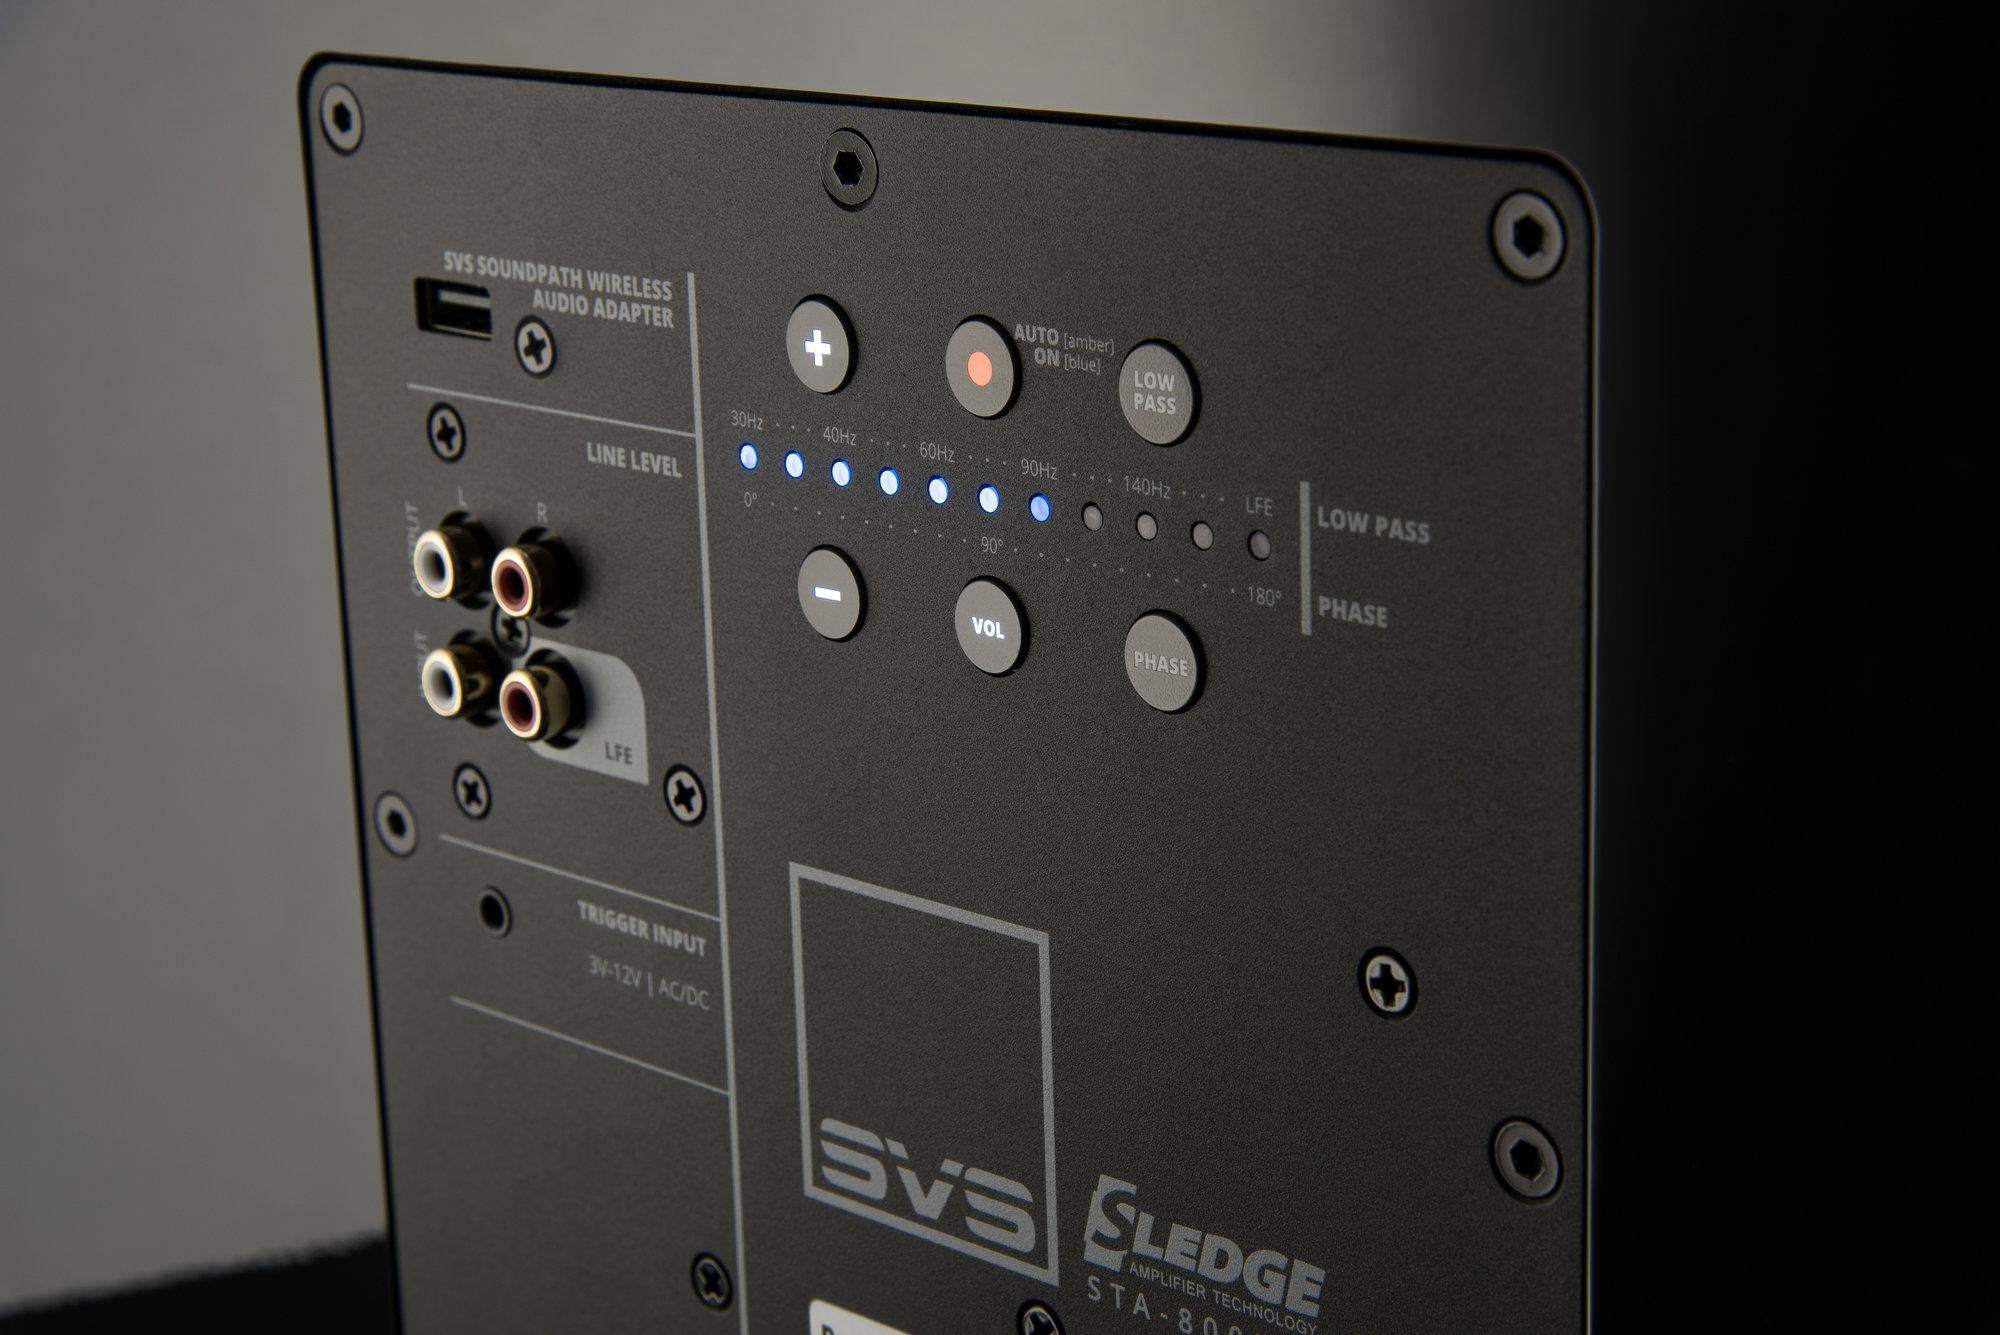 Interface de contrôle intelligente PB-3000